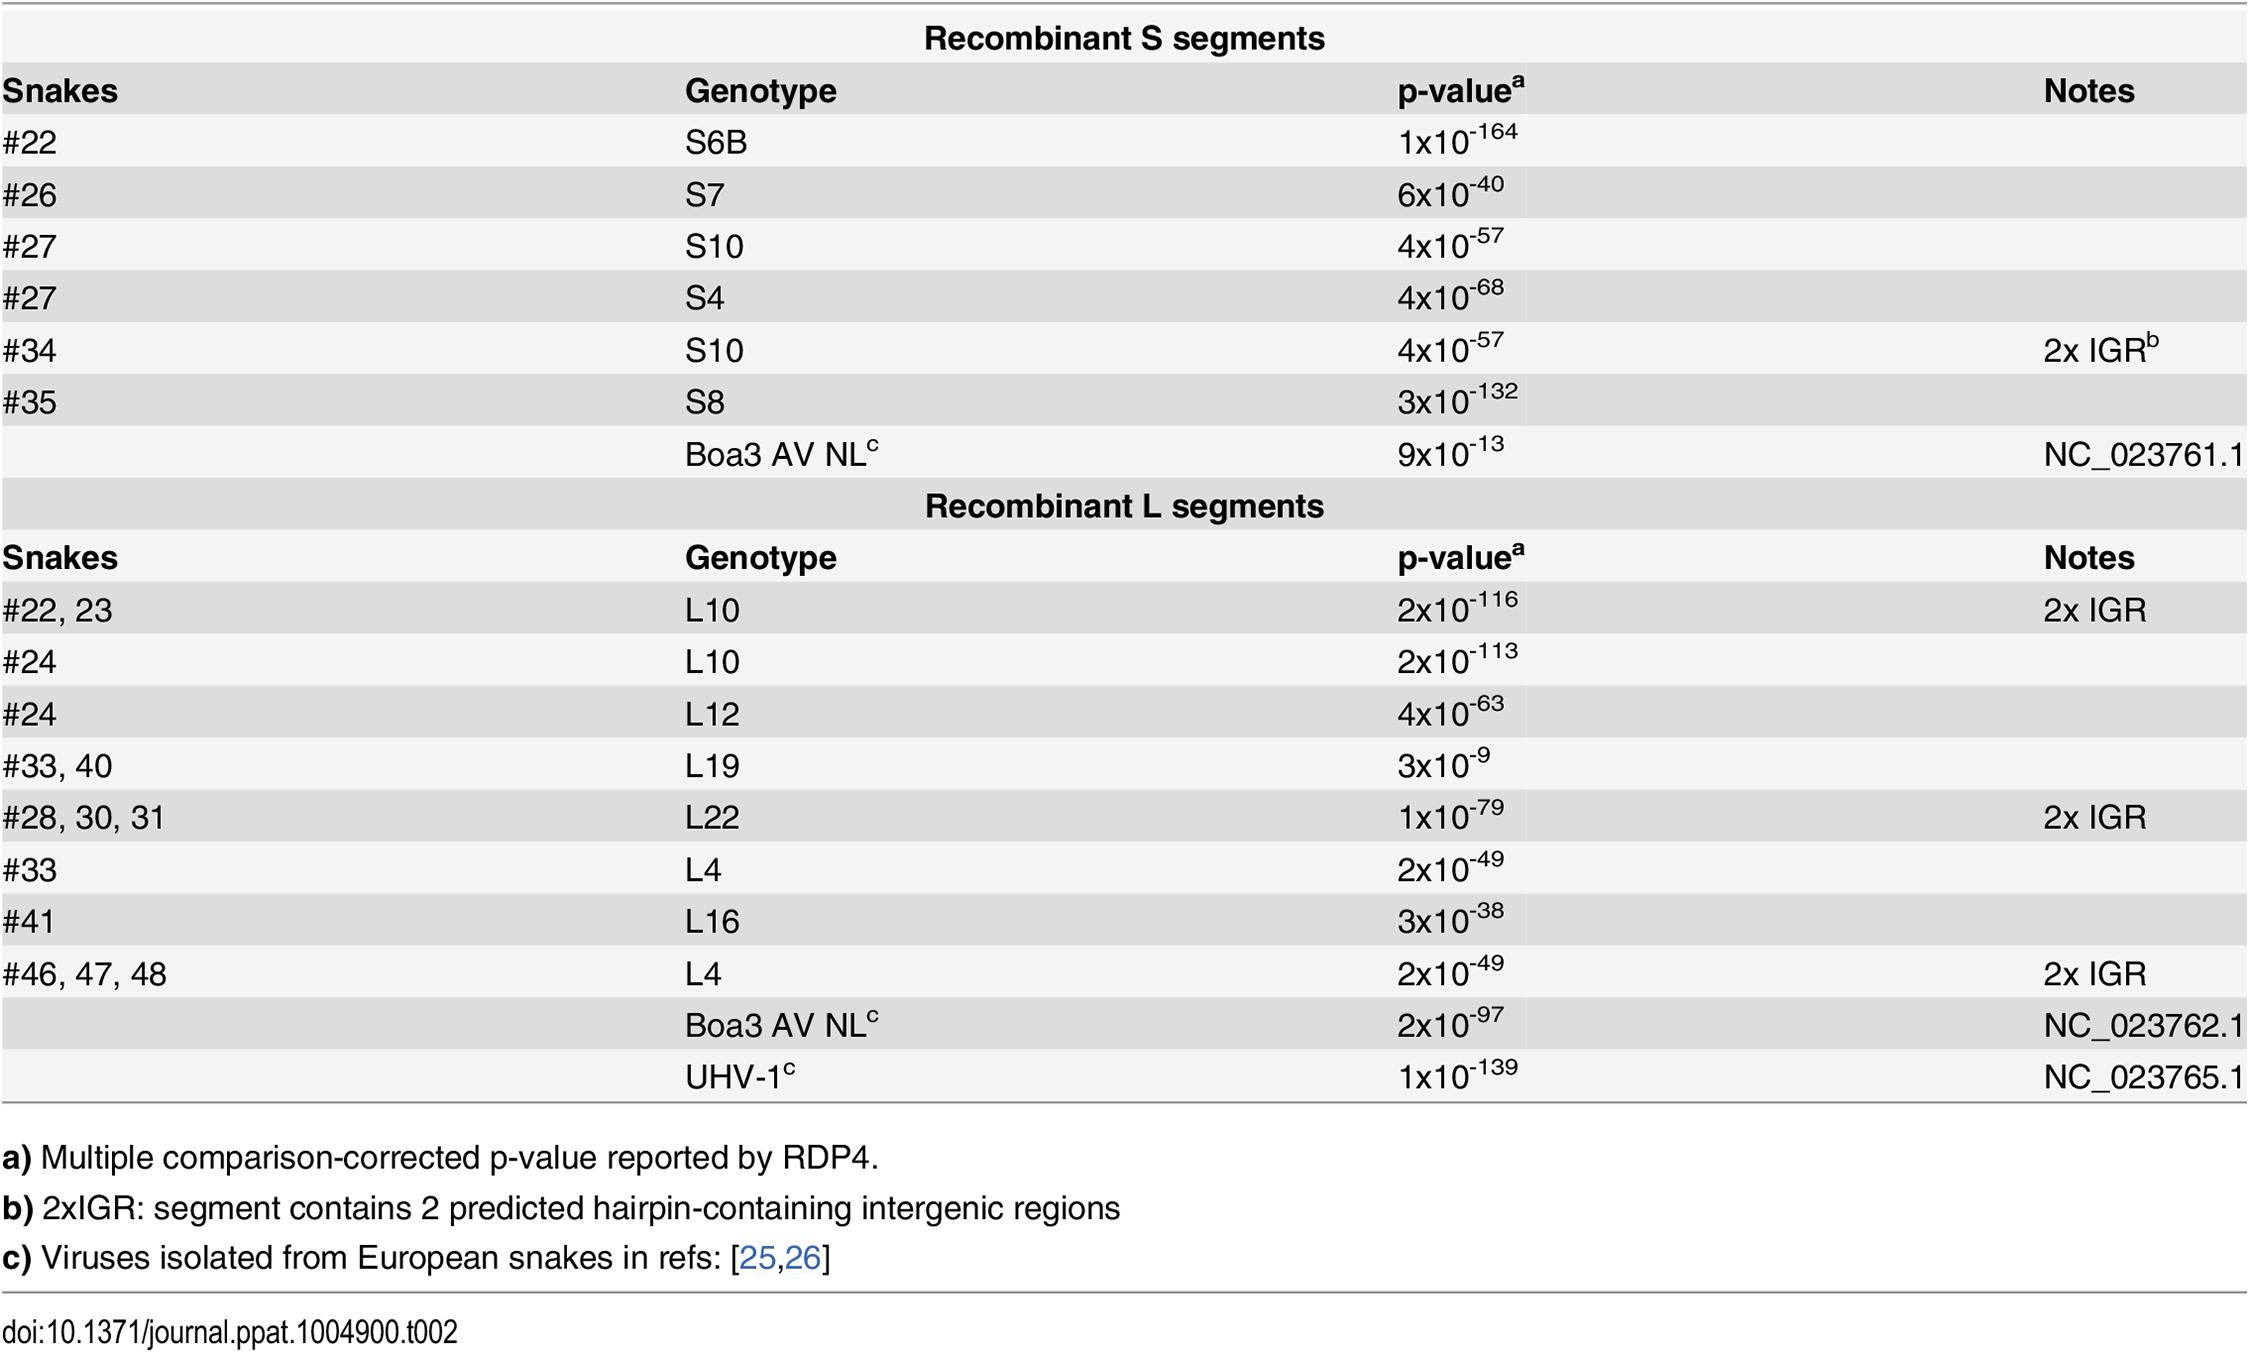 Summary of recombinant genome segments identified.